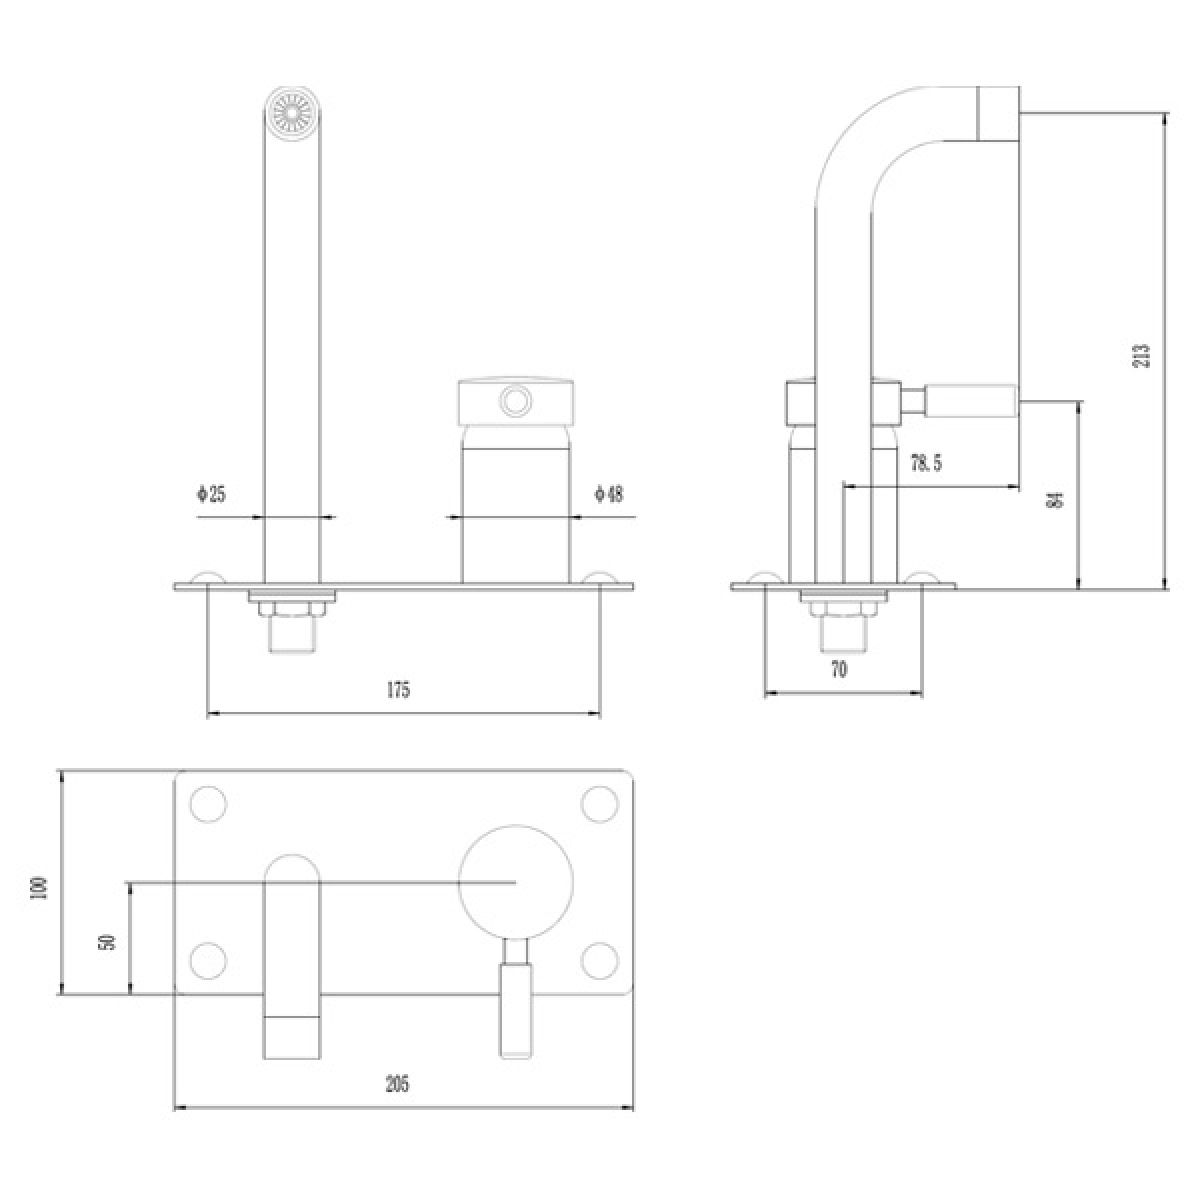 Hudson Reed Tec Single Lever Wall Mounted Basin Bath Filler Tap  Measurements